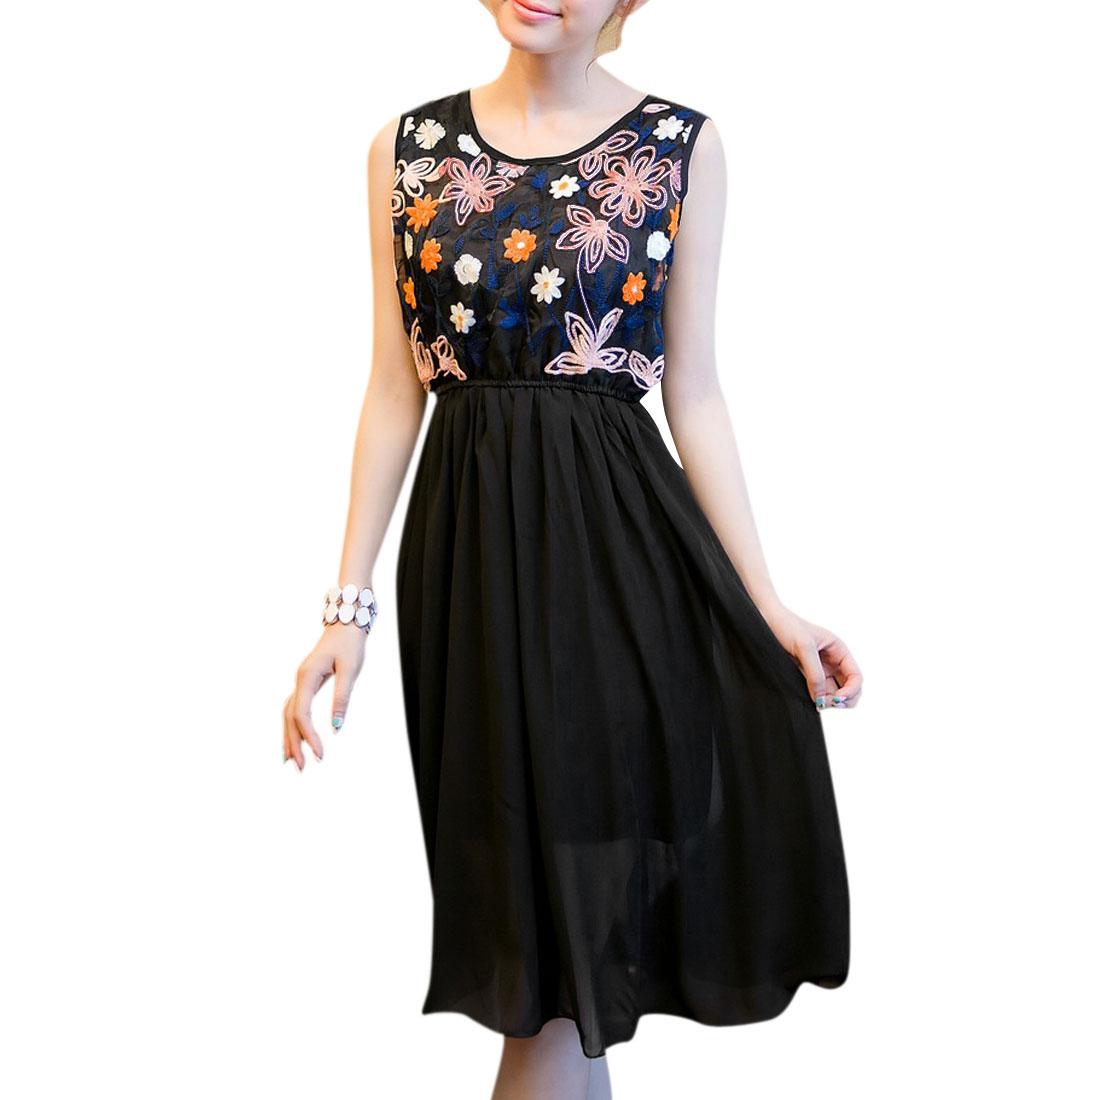 Women Newly Crochet Flower Front Semi-Sheer Hollow Back Black Dress S